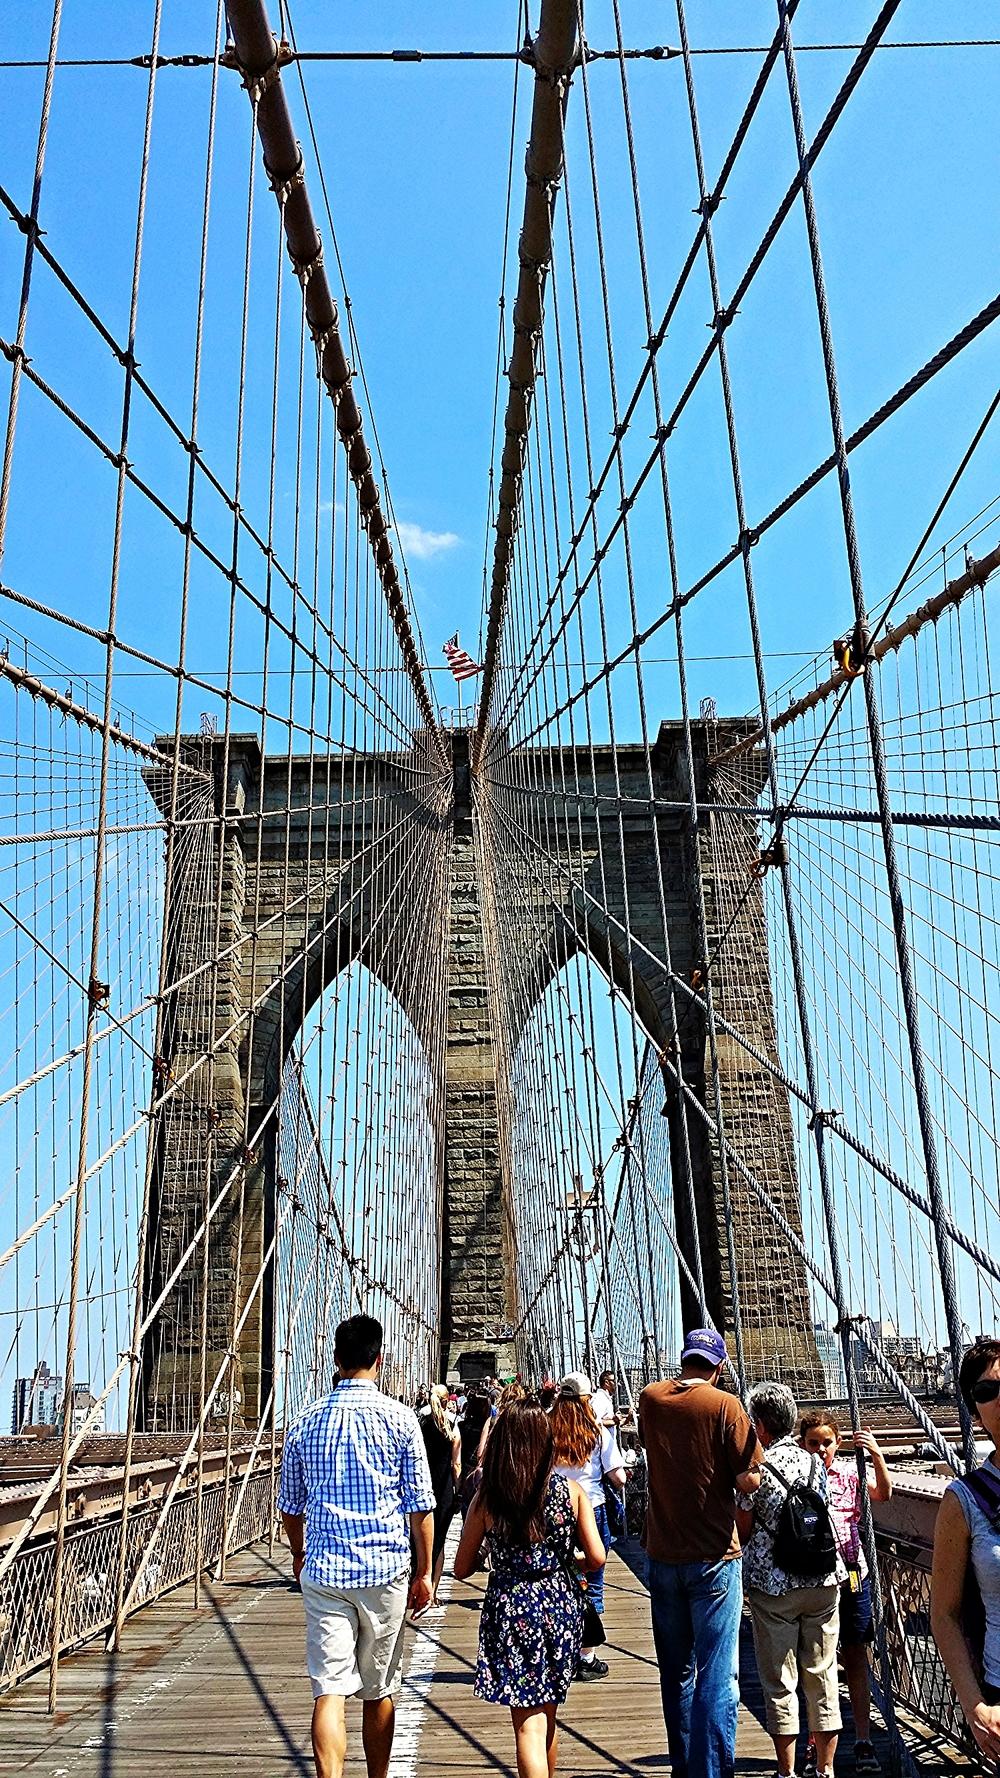 Shot from the Brooklyn Bridge. I love my new camera phone, it's pretty dope!